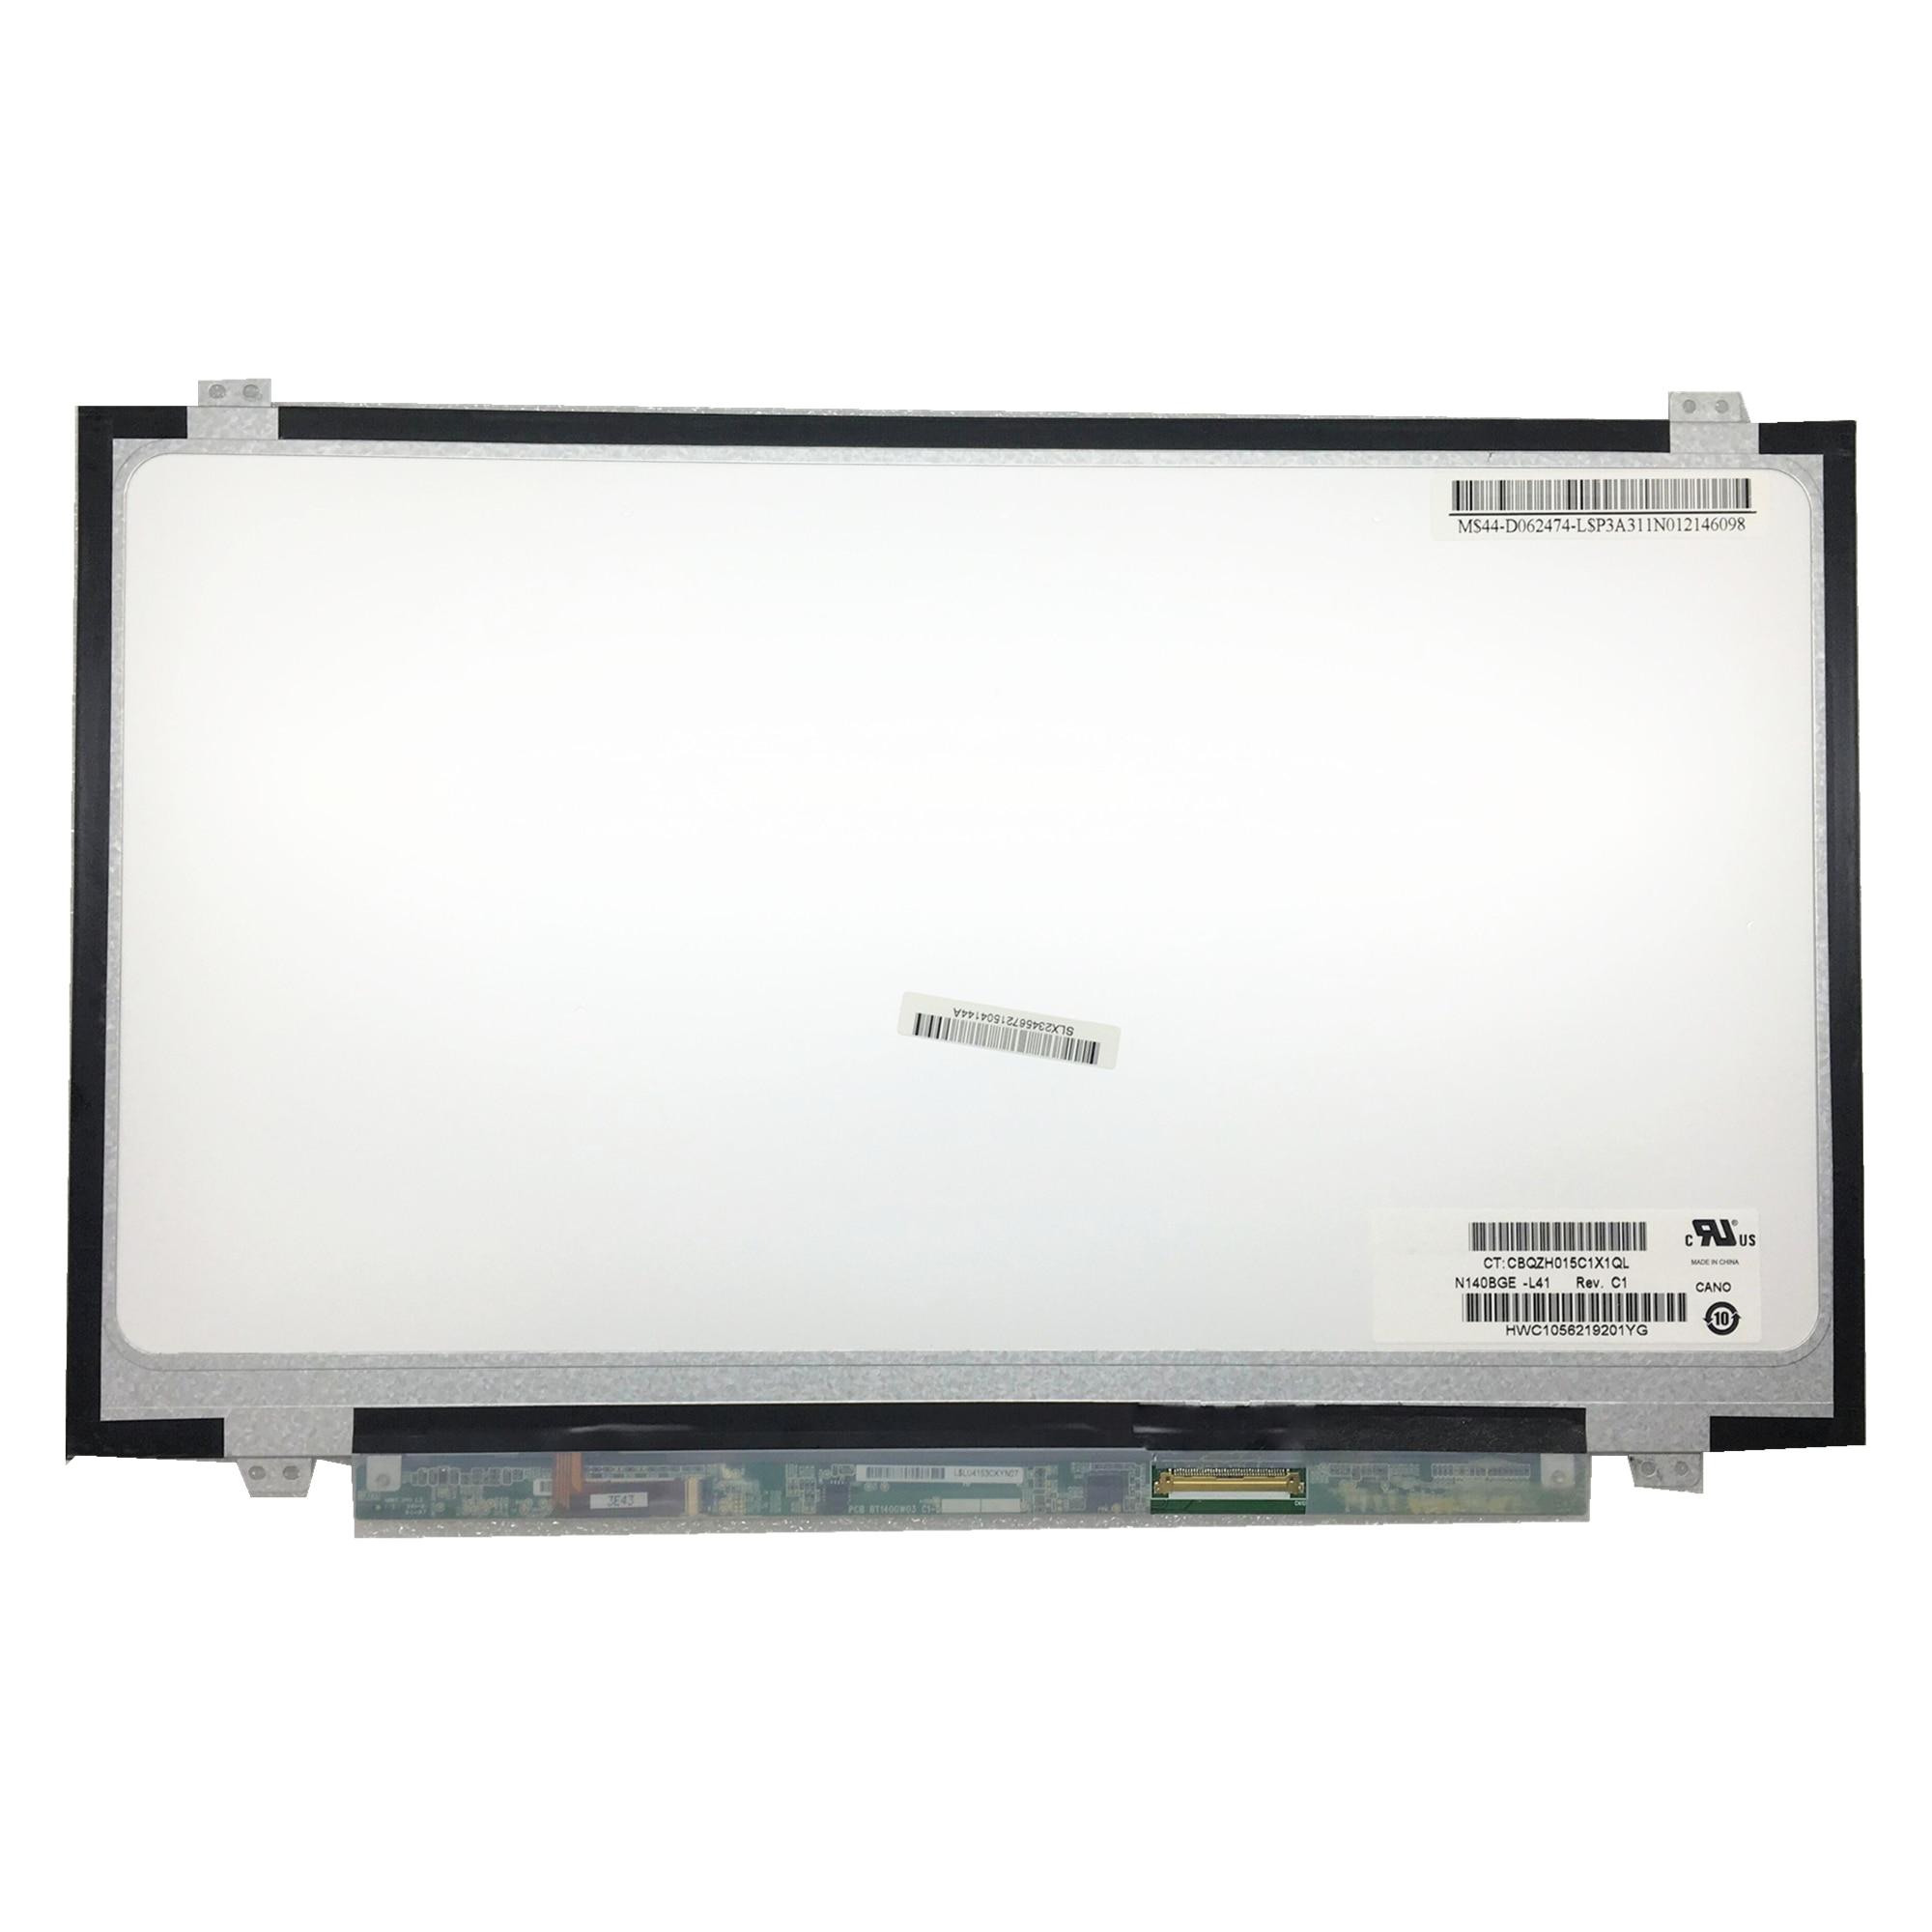 Free shipping N140BGE L41 N140BGE LA3 HSD140PHW2 N140BGE L33 N140BGE L42 N140BGE L43 Laptop LCD Screen